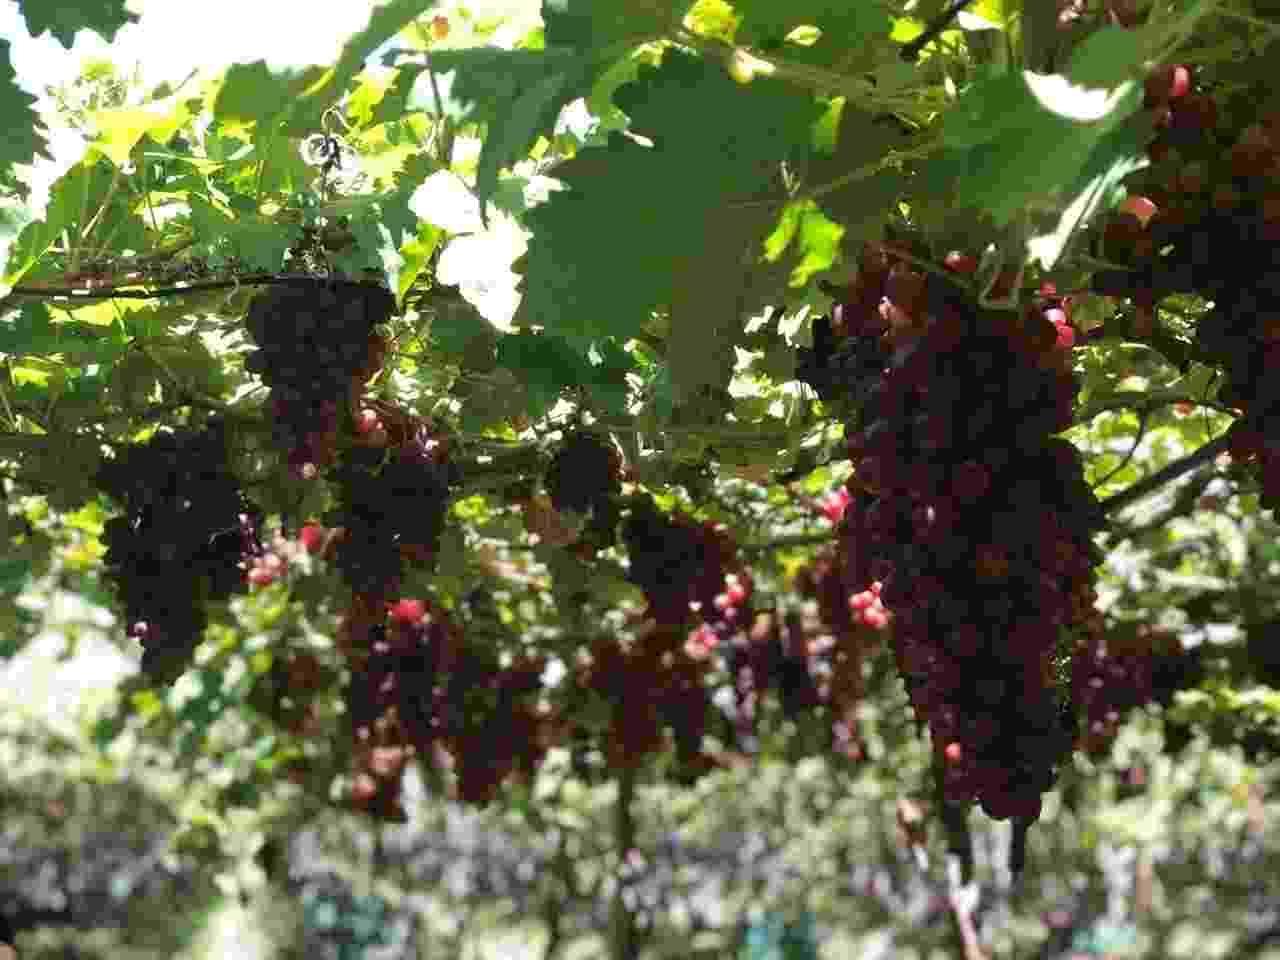 cacho de uvas - Luciana Amaral/UOL